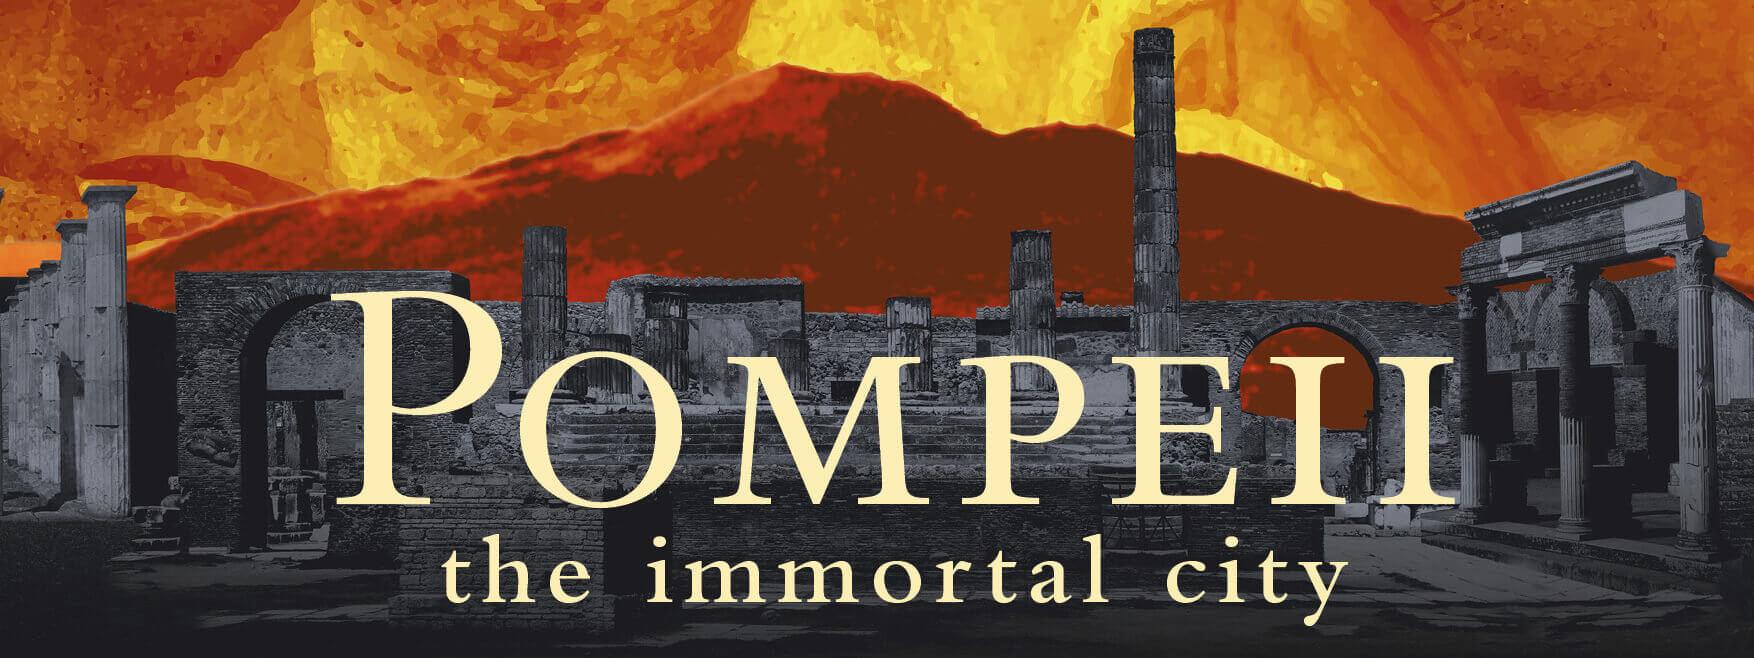 Pompeii the immortal city logo